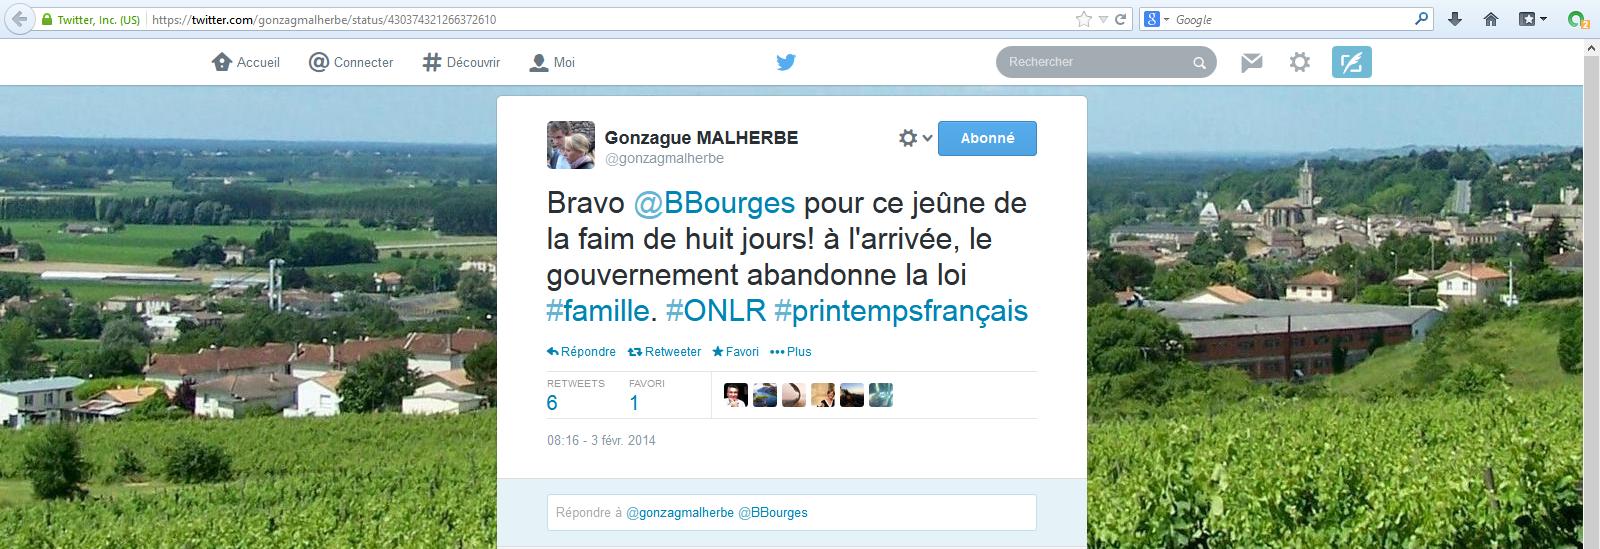 Gonzague-Malherbe-03-02-14-Beatrice-Bourges